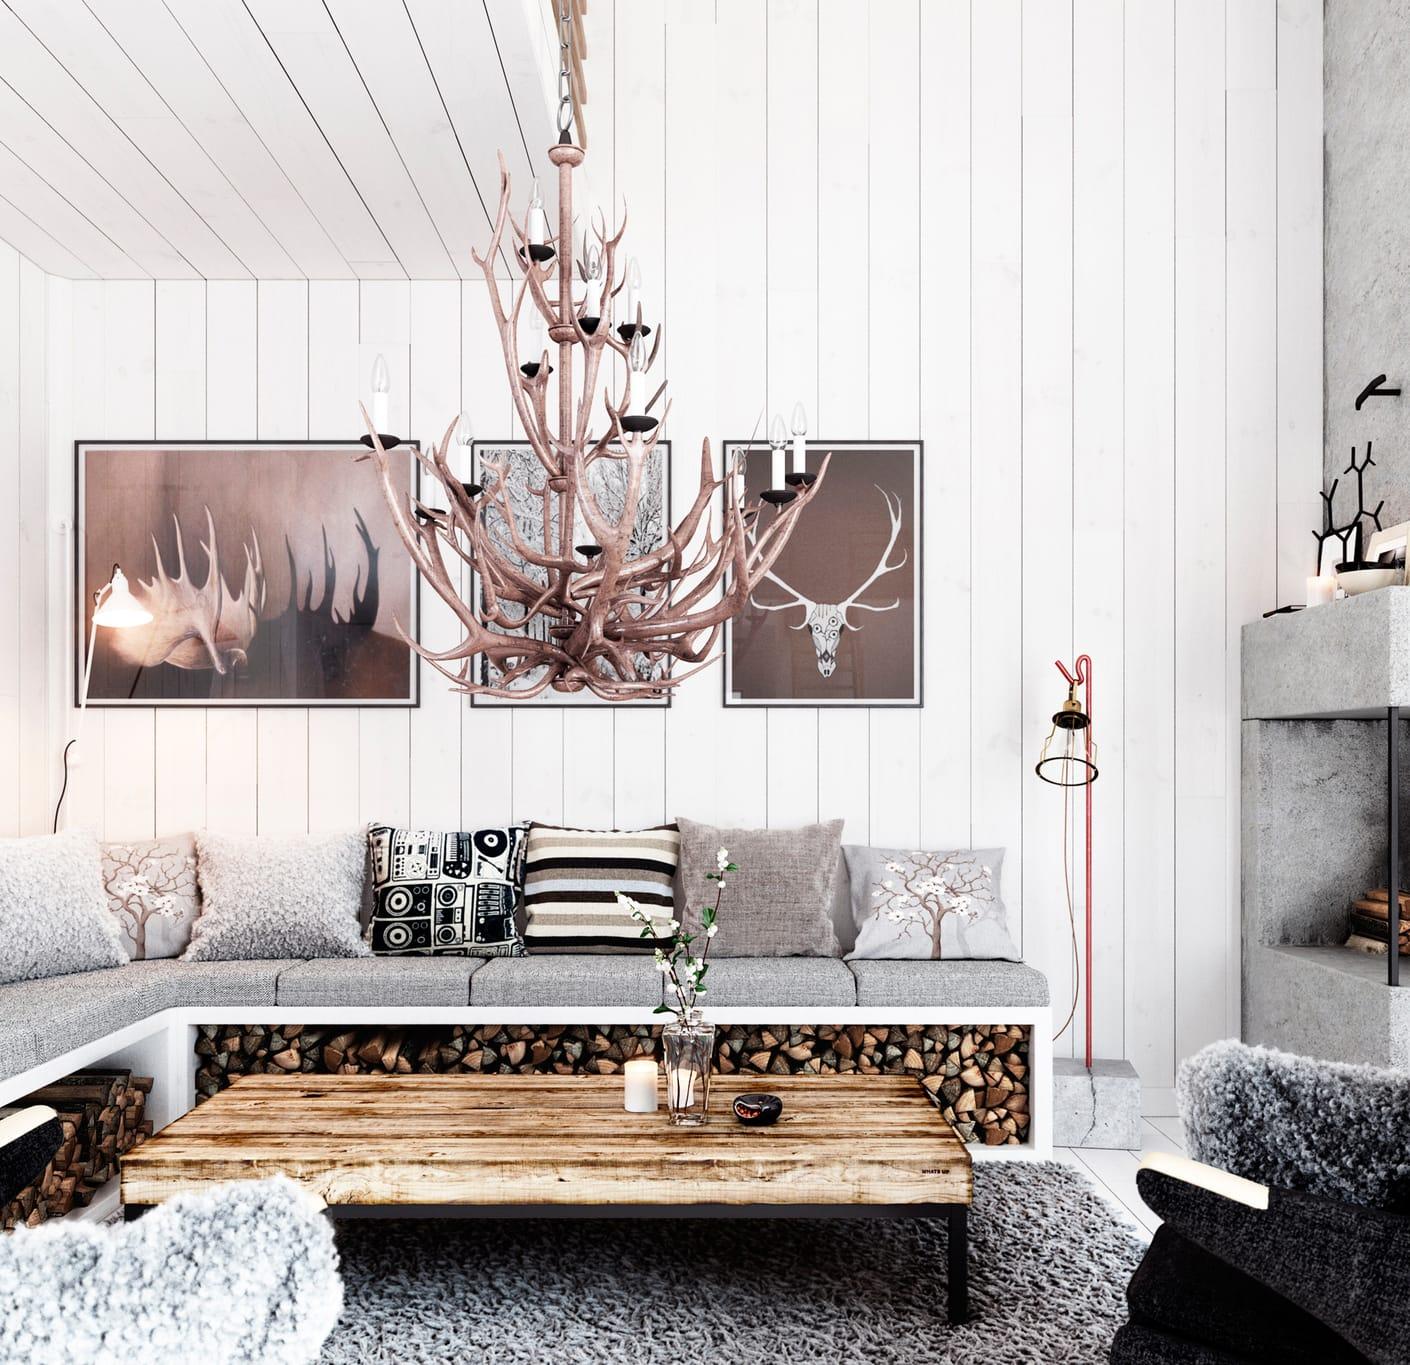 michael dillner hunters house interior design vray 3ds max 03